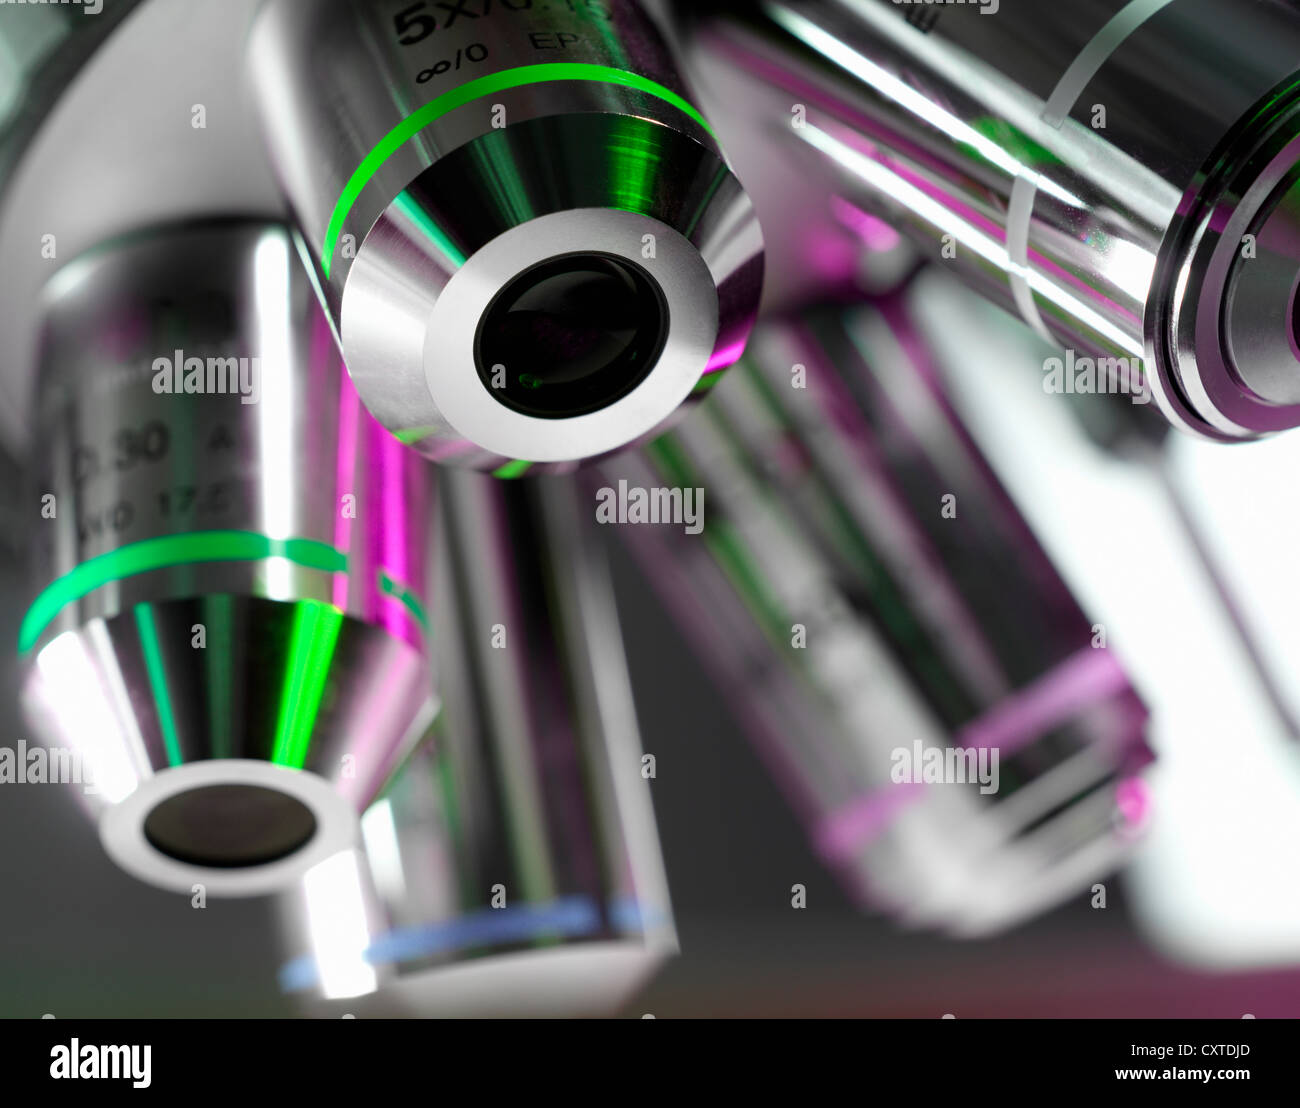 Nahaufnahme von Mikroskop-Objektive im Labor Stockbild